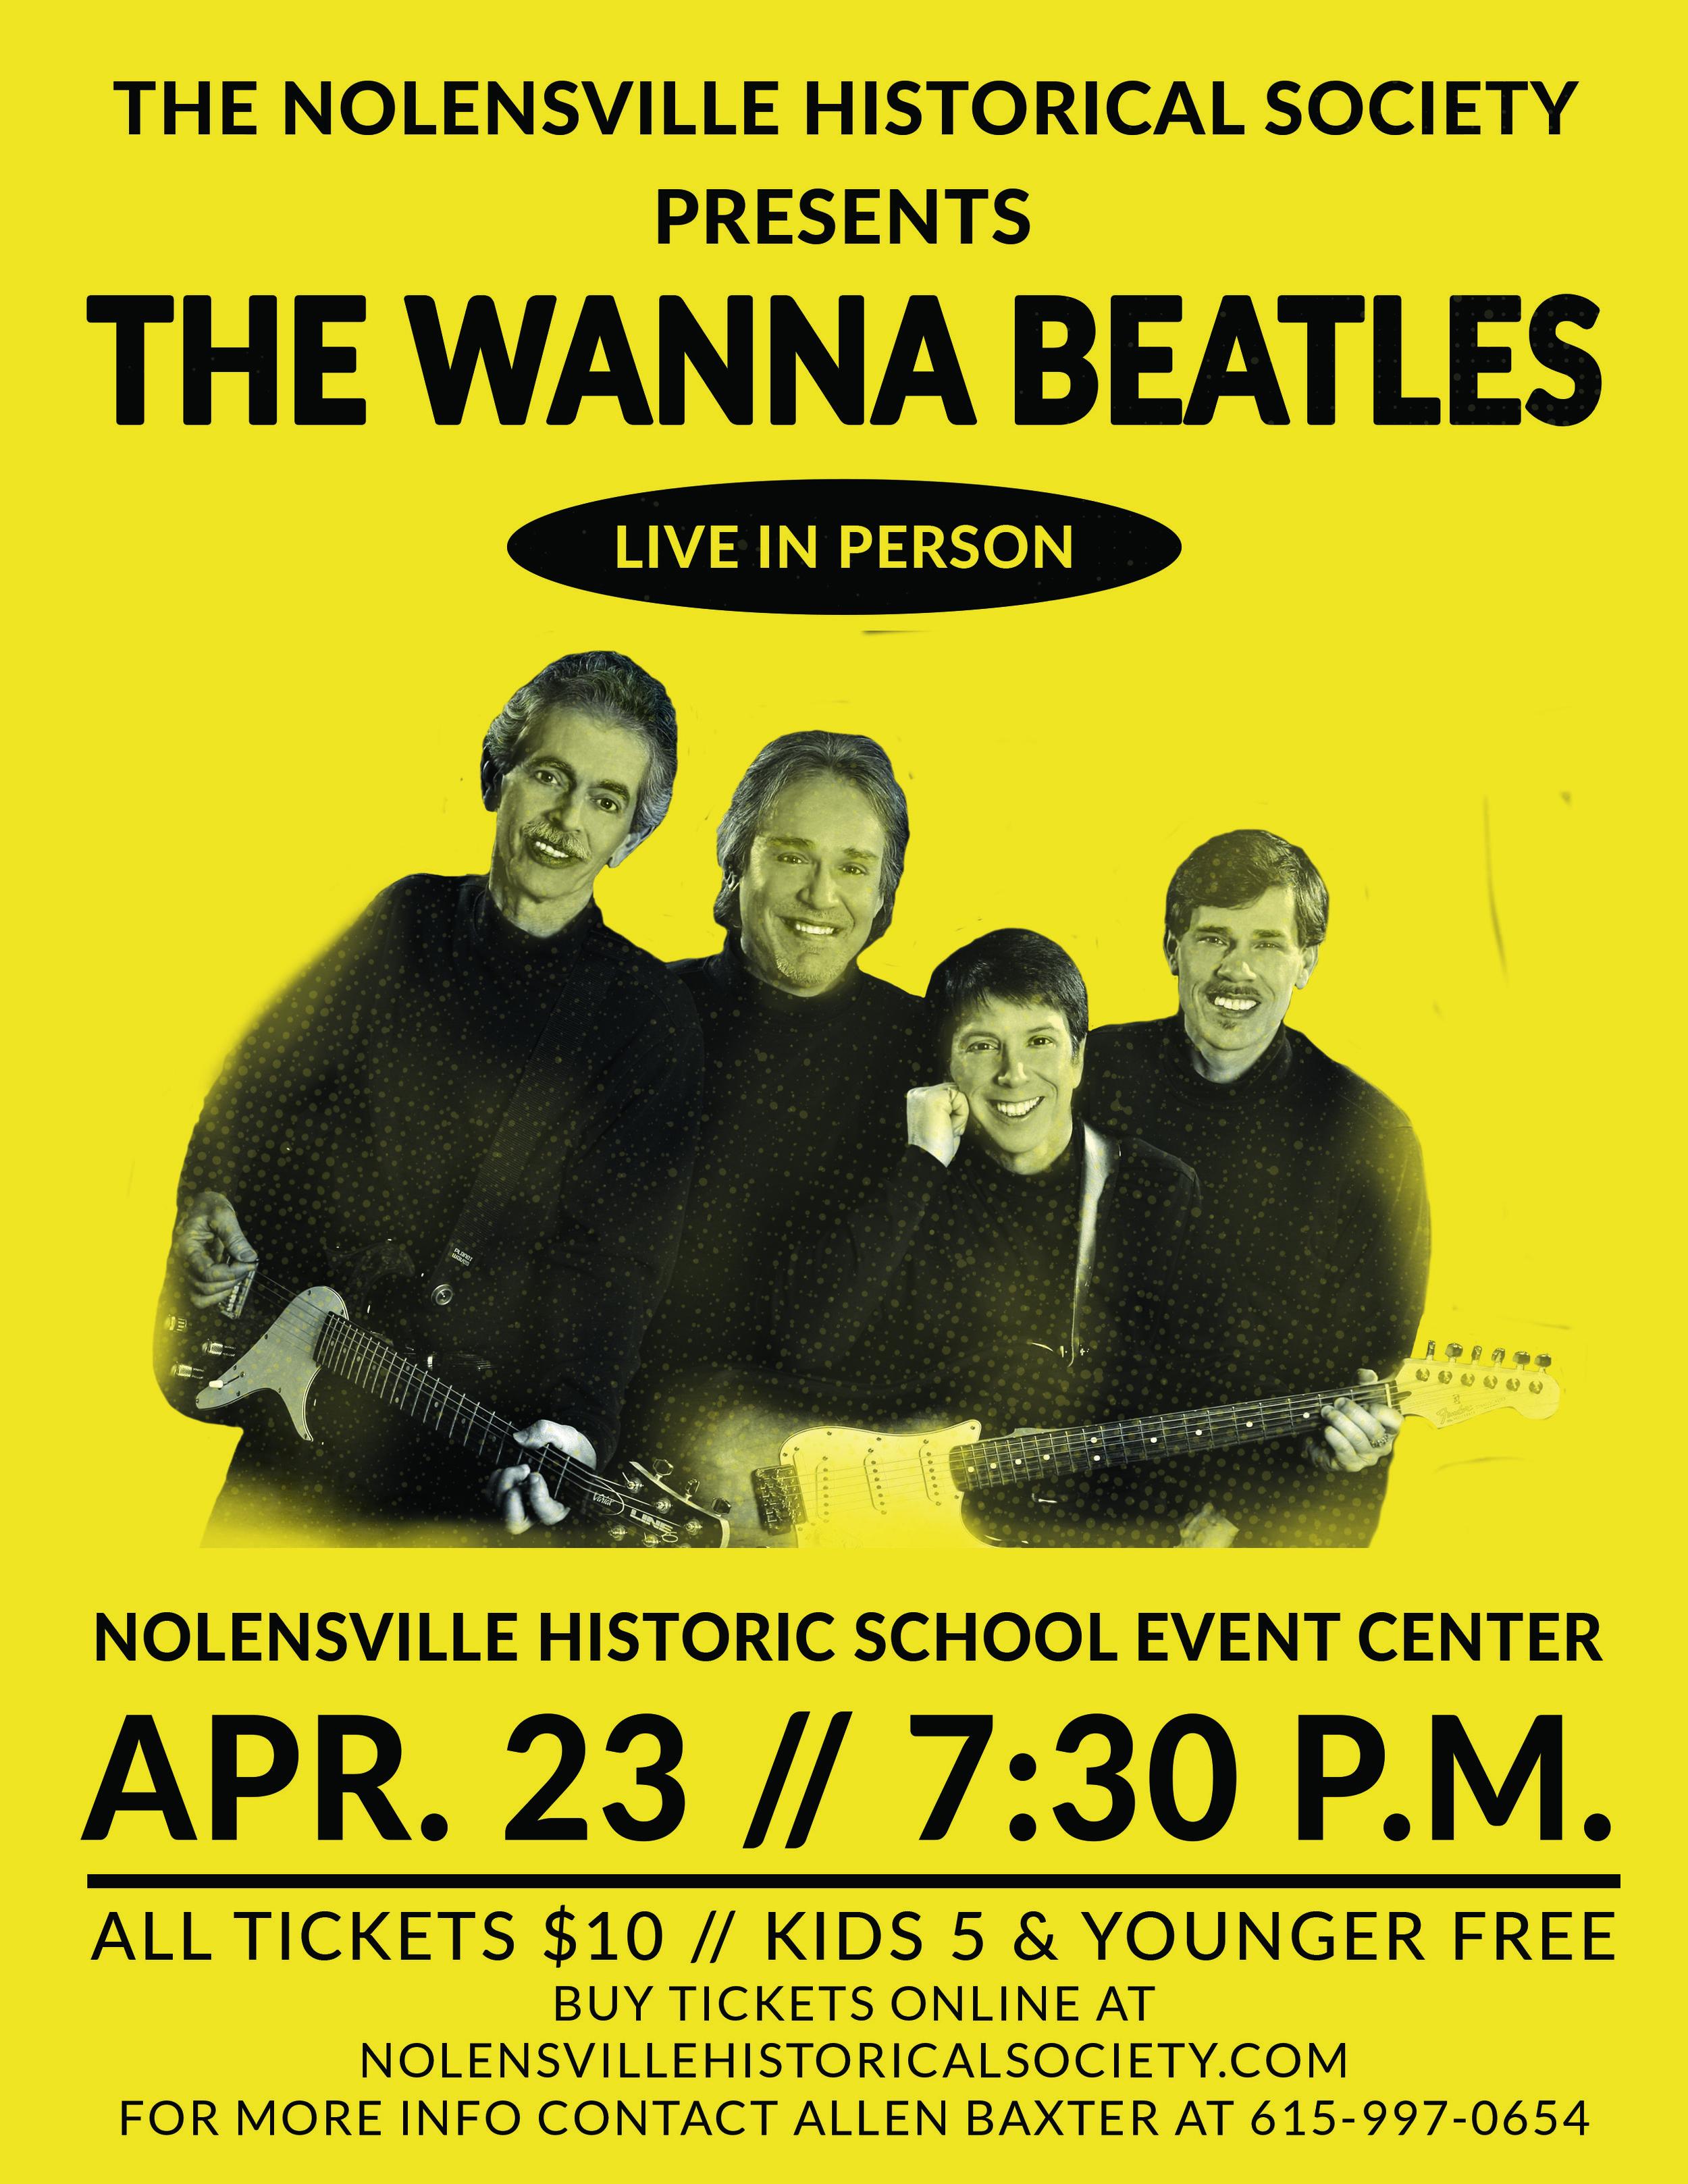 WannaBeatles Concert Flyer